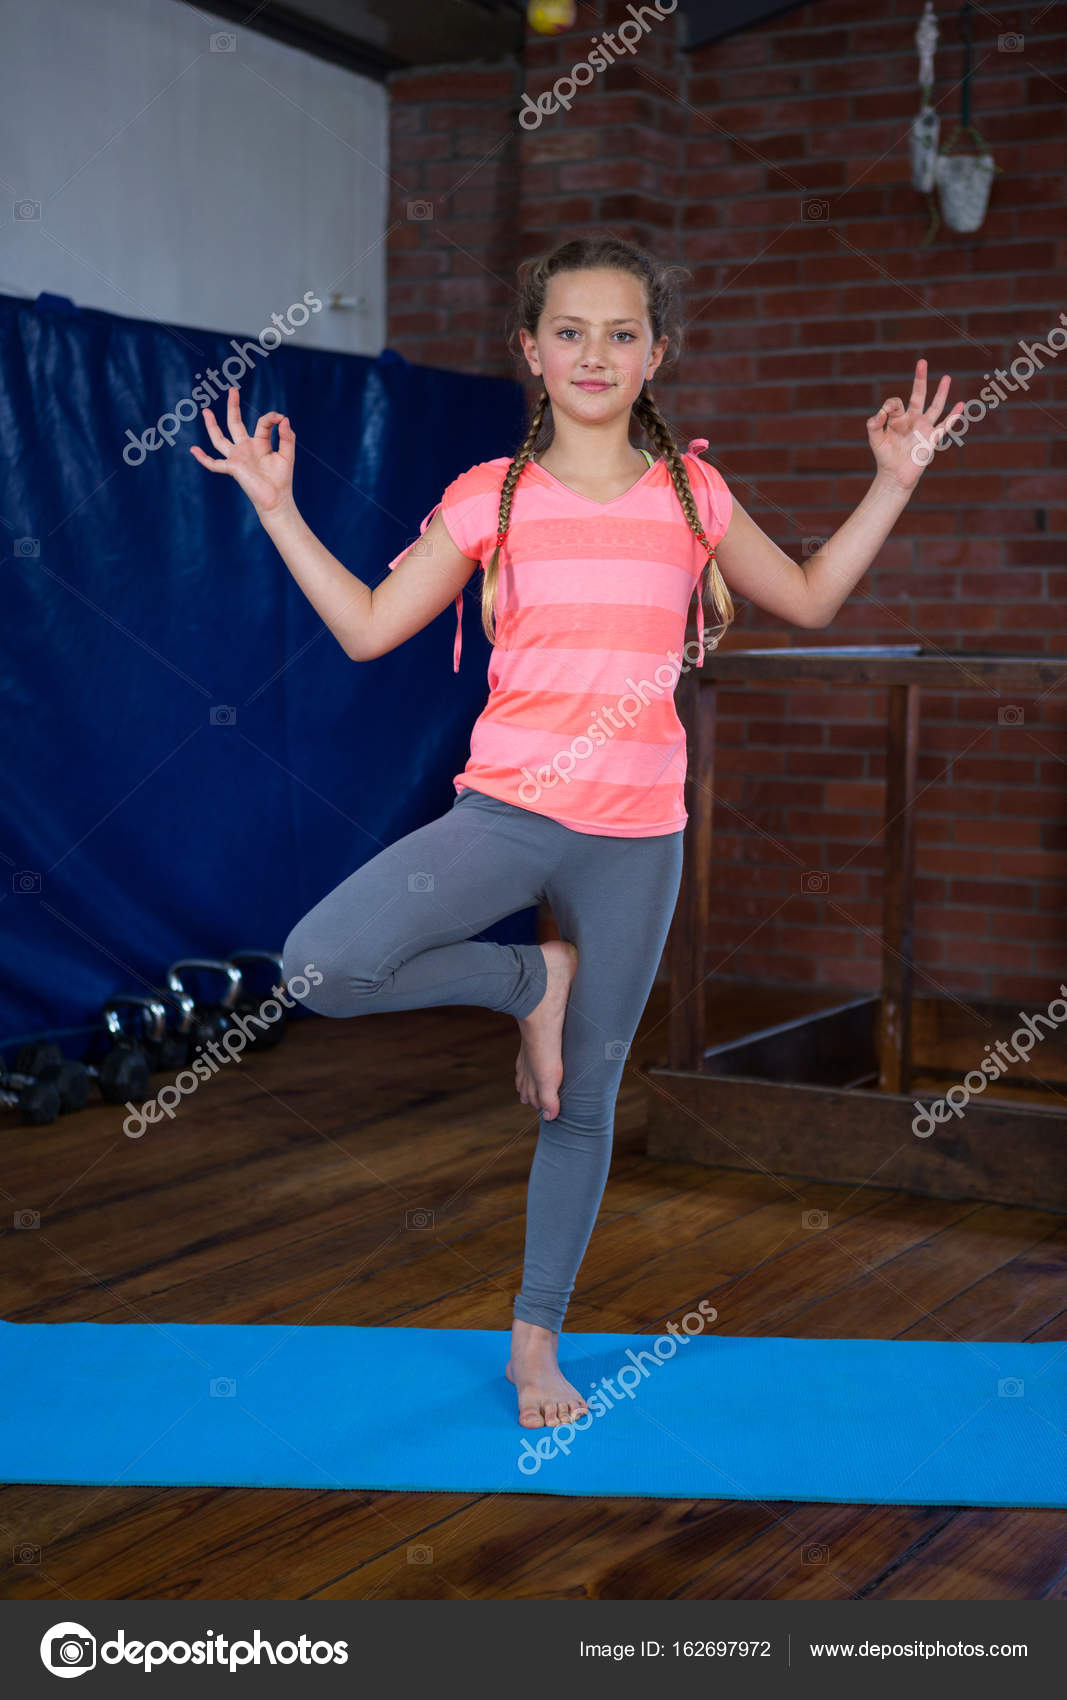 Teenage Girl Practicing Yoga Stock Photo C Wavebreakmedia 162697972